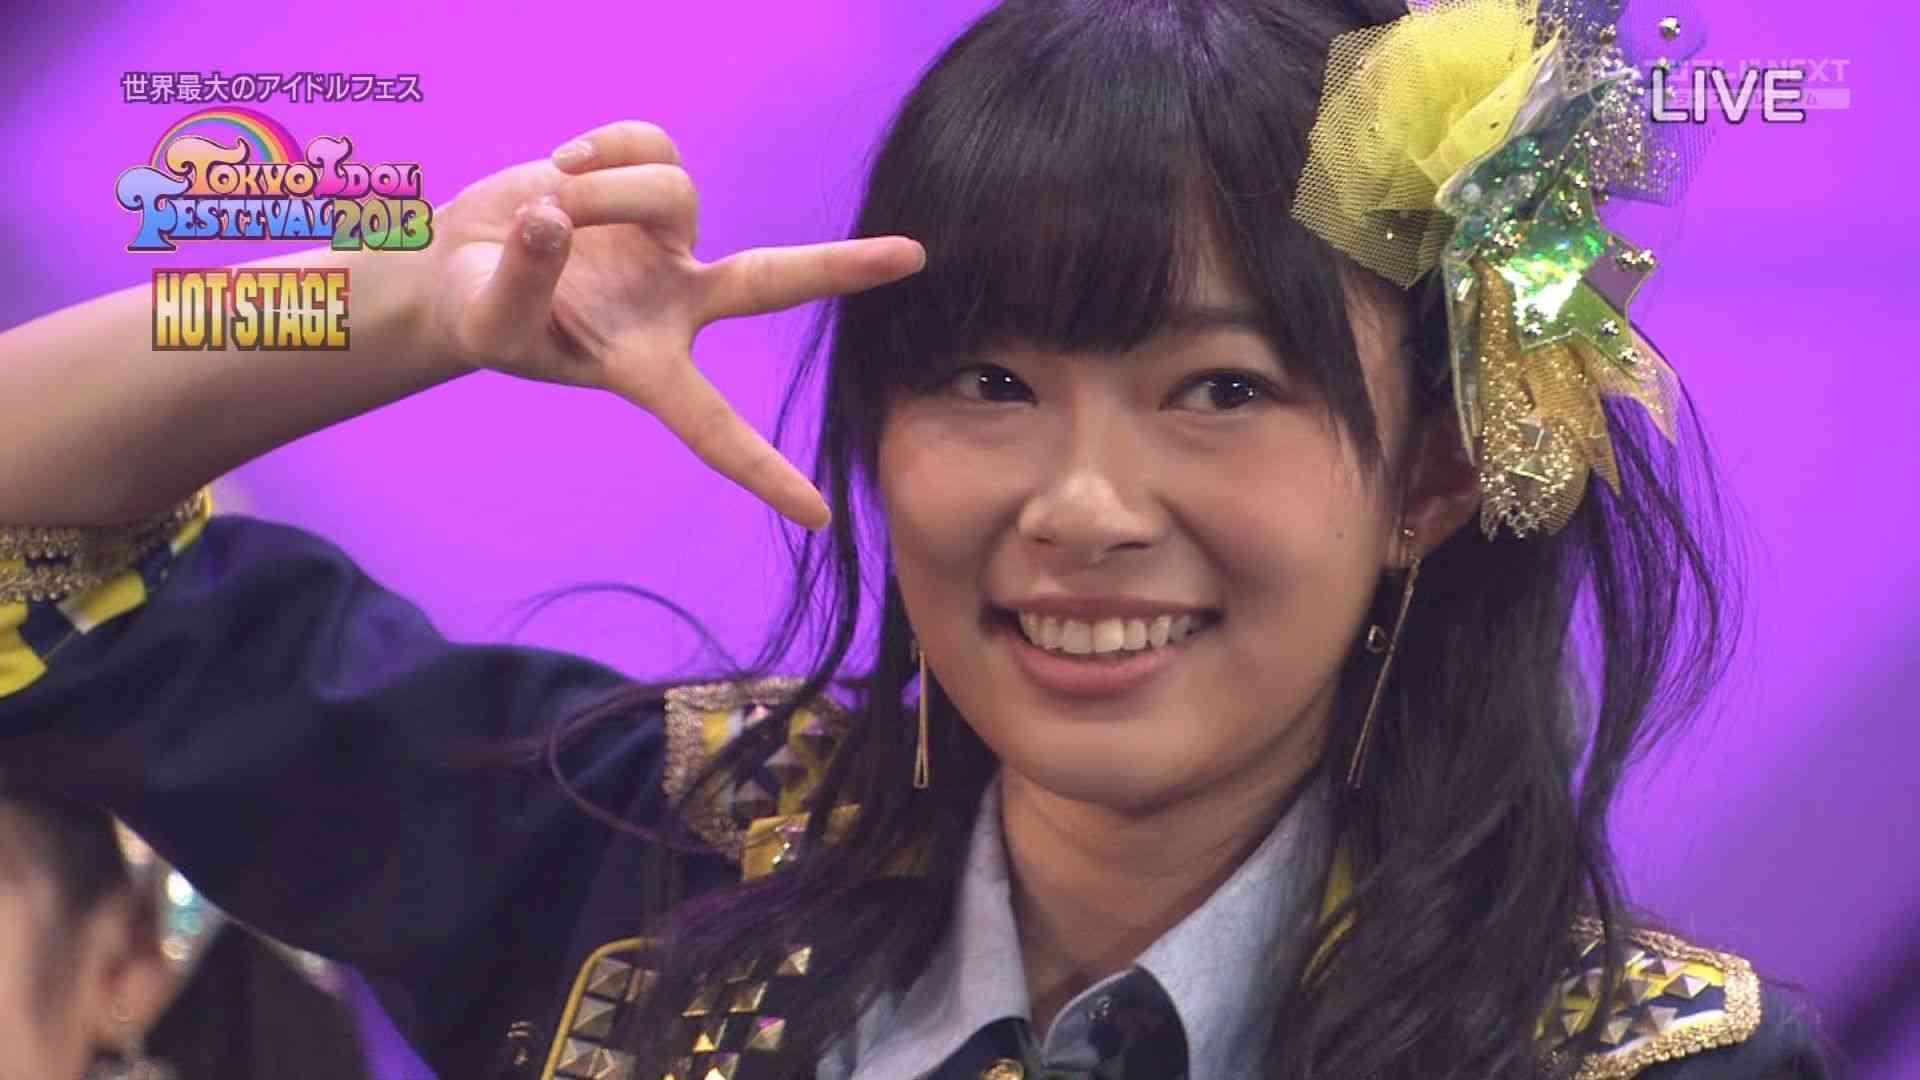 HKT48指原莉乃、新曲がまさかの14位発進!「ムカつく」発言で大炎上の悲劇